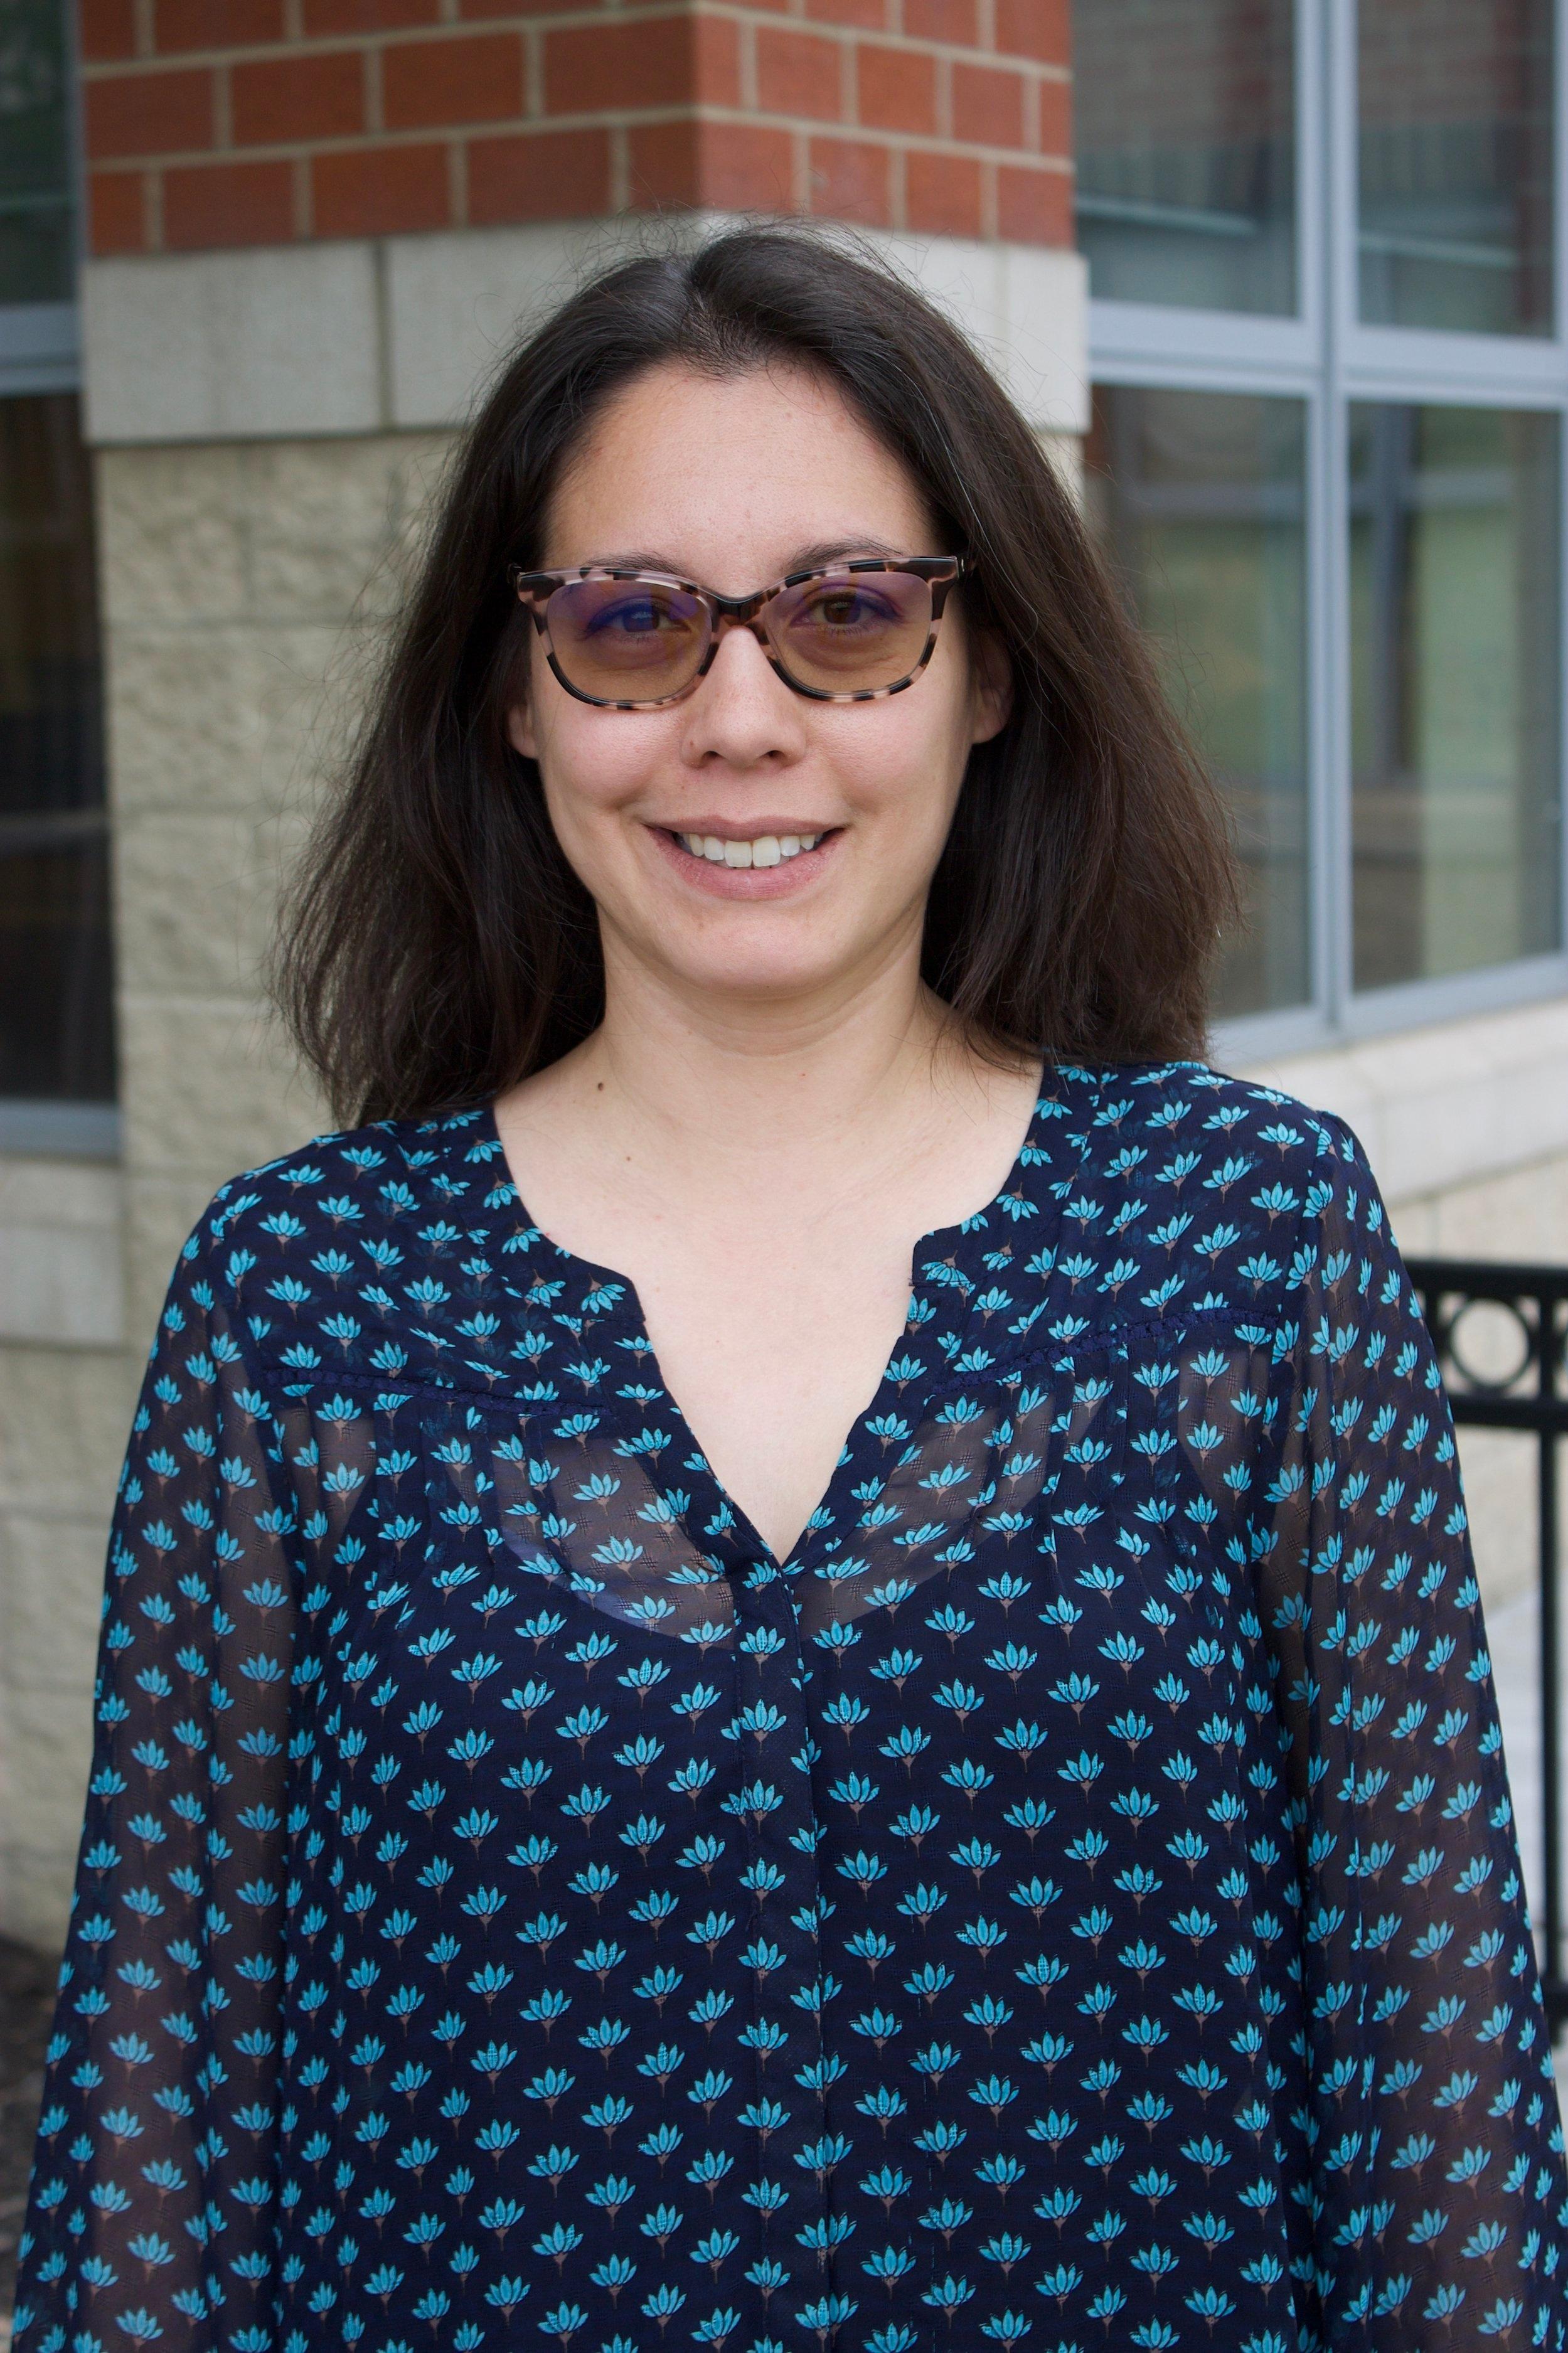 Iris Witmer   - Middle School Science Teacher (Room 1007)